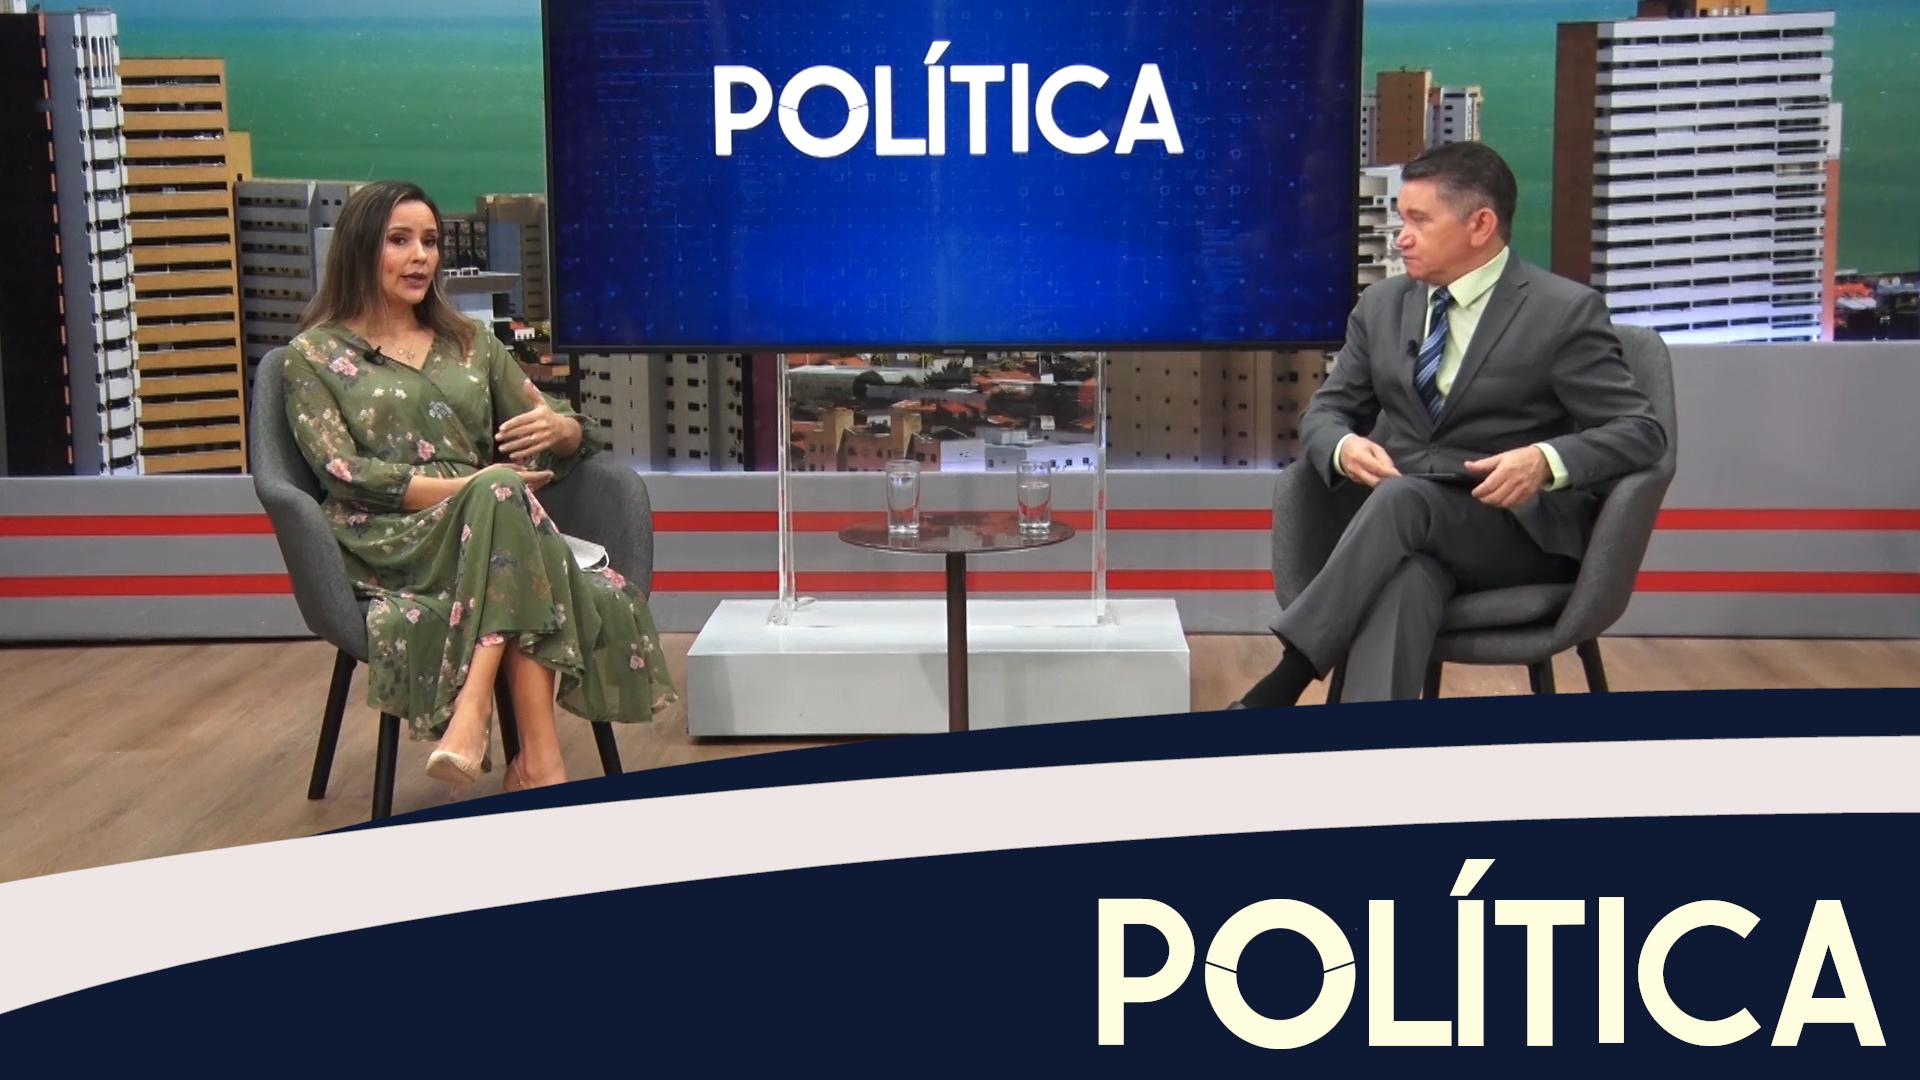 Política entrevista entrevista Carla Michele, cientista política